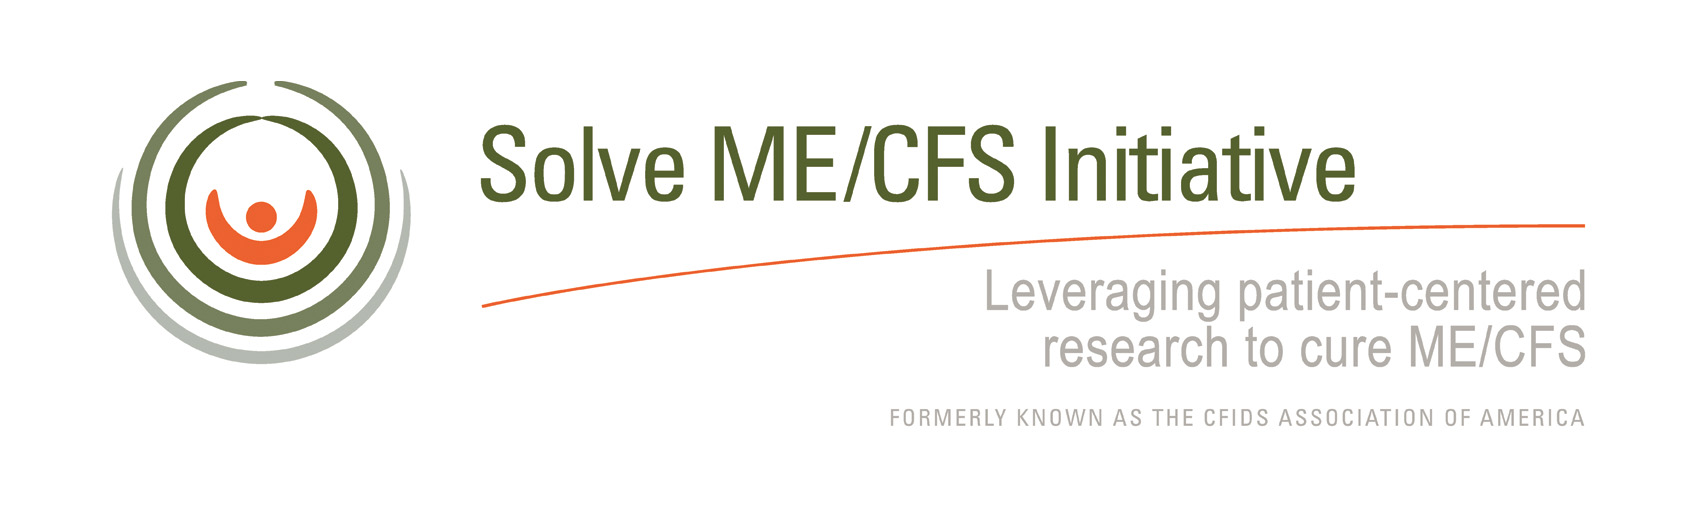 CFSME_logomain_fkacfids